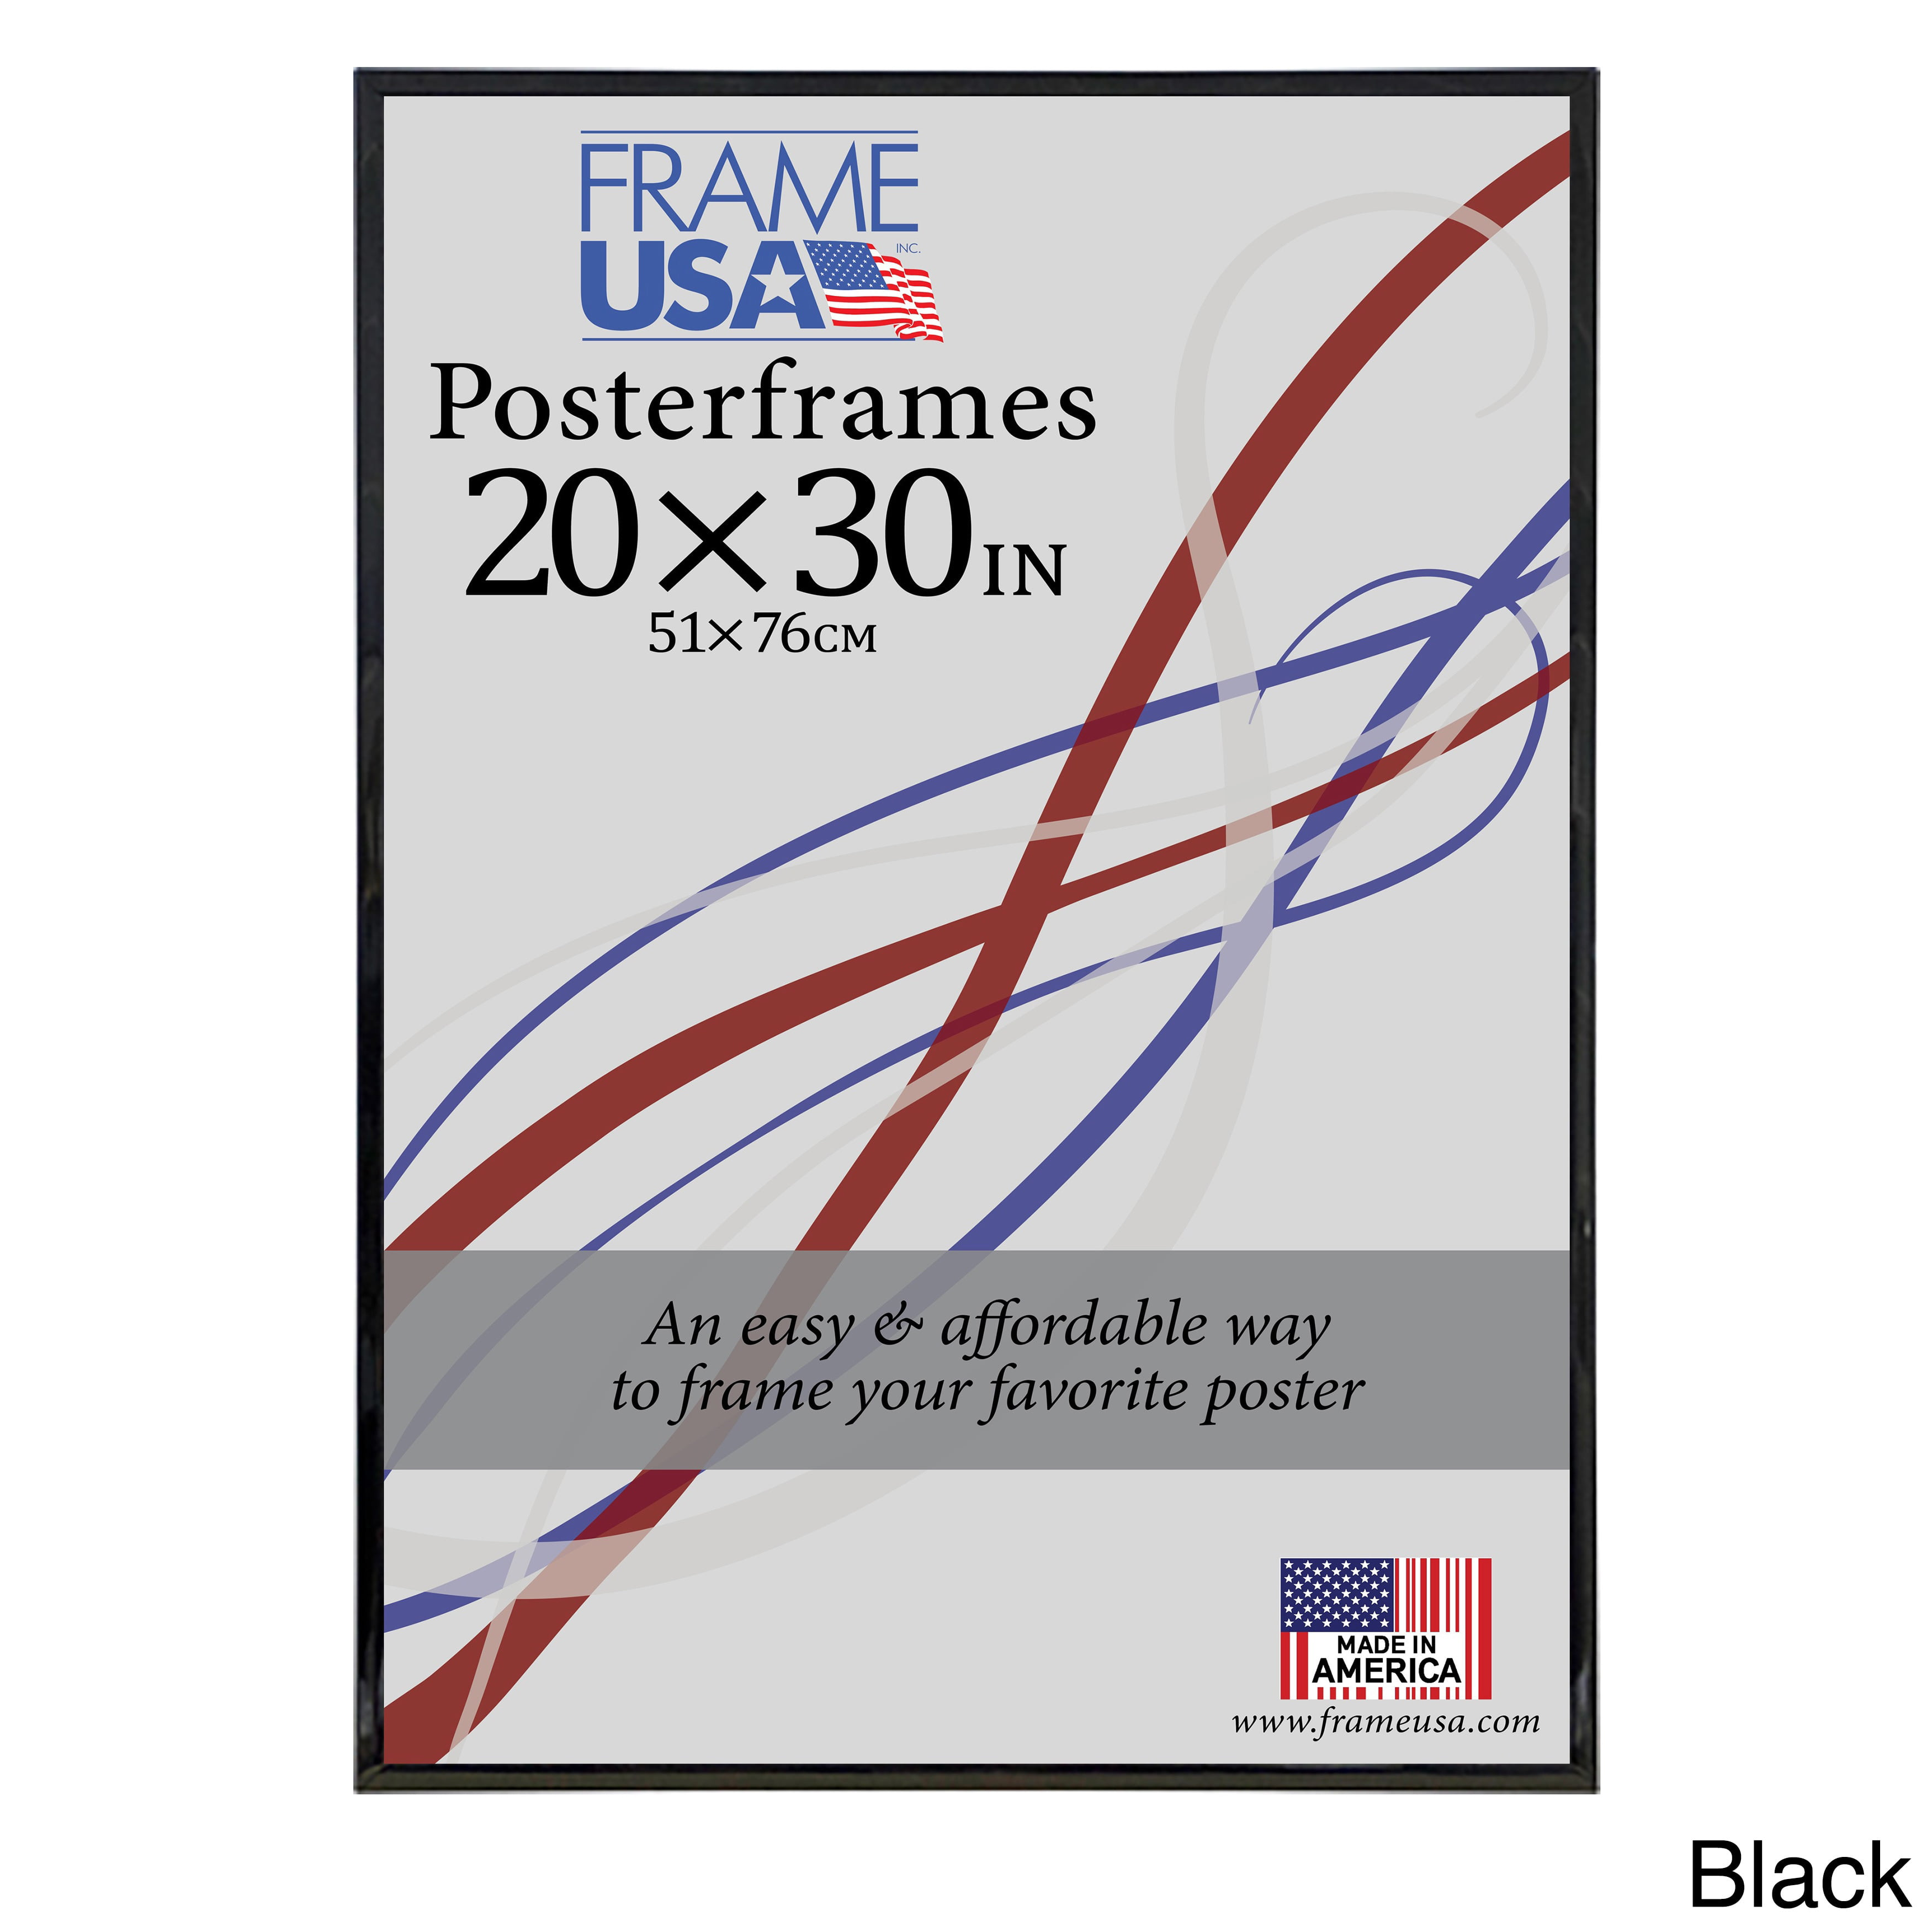 frame usa hardboard poster frame 20 x 30 inch image size walmart com